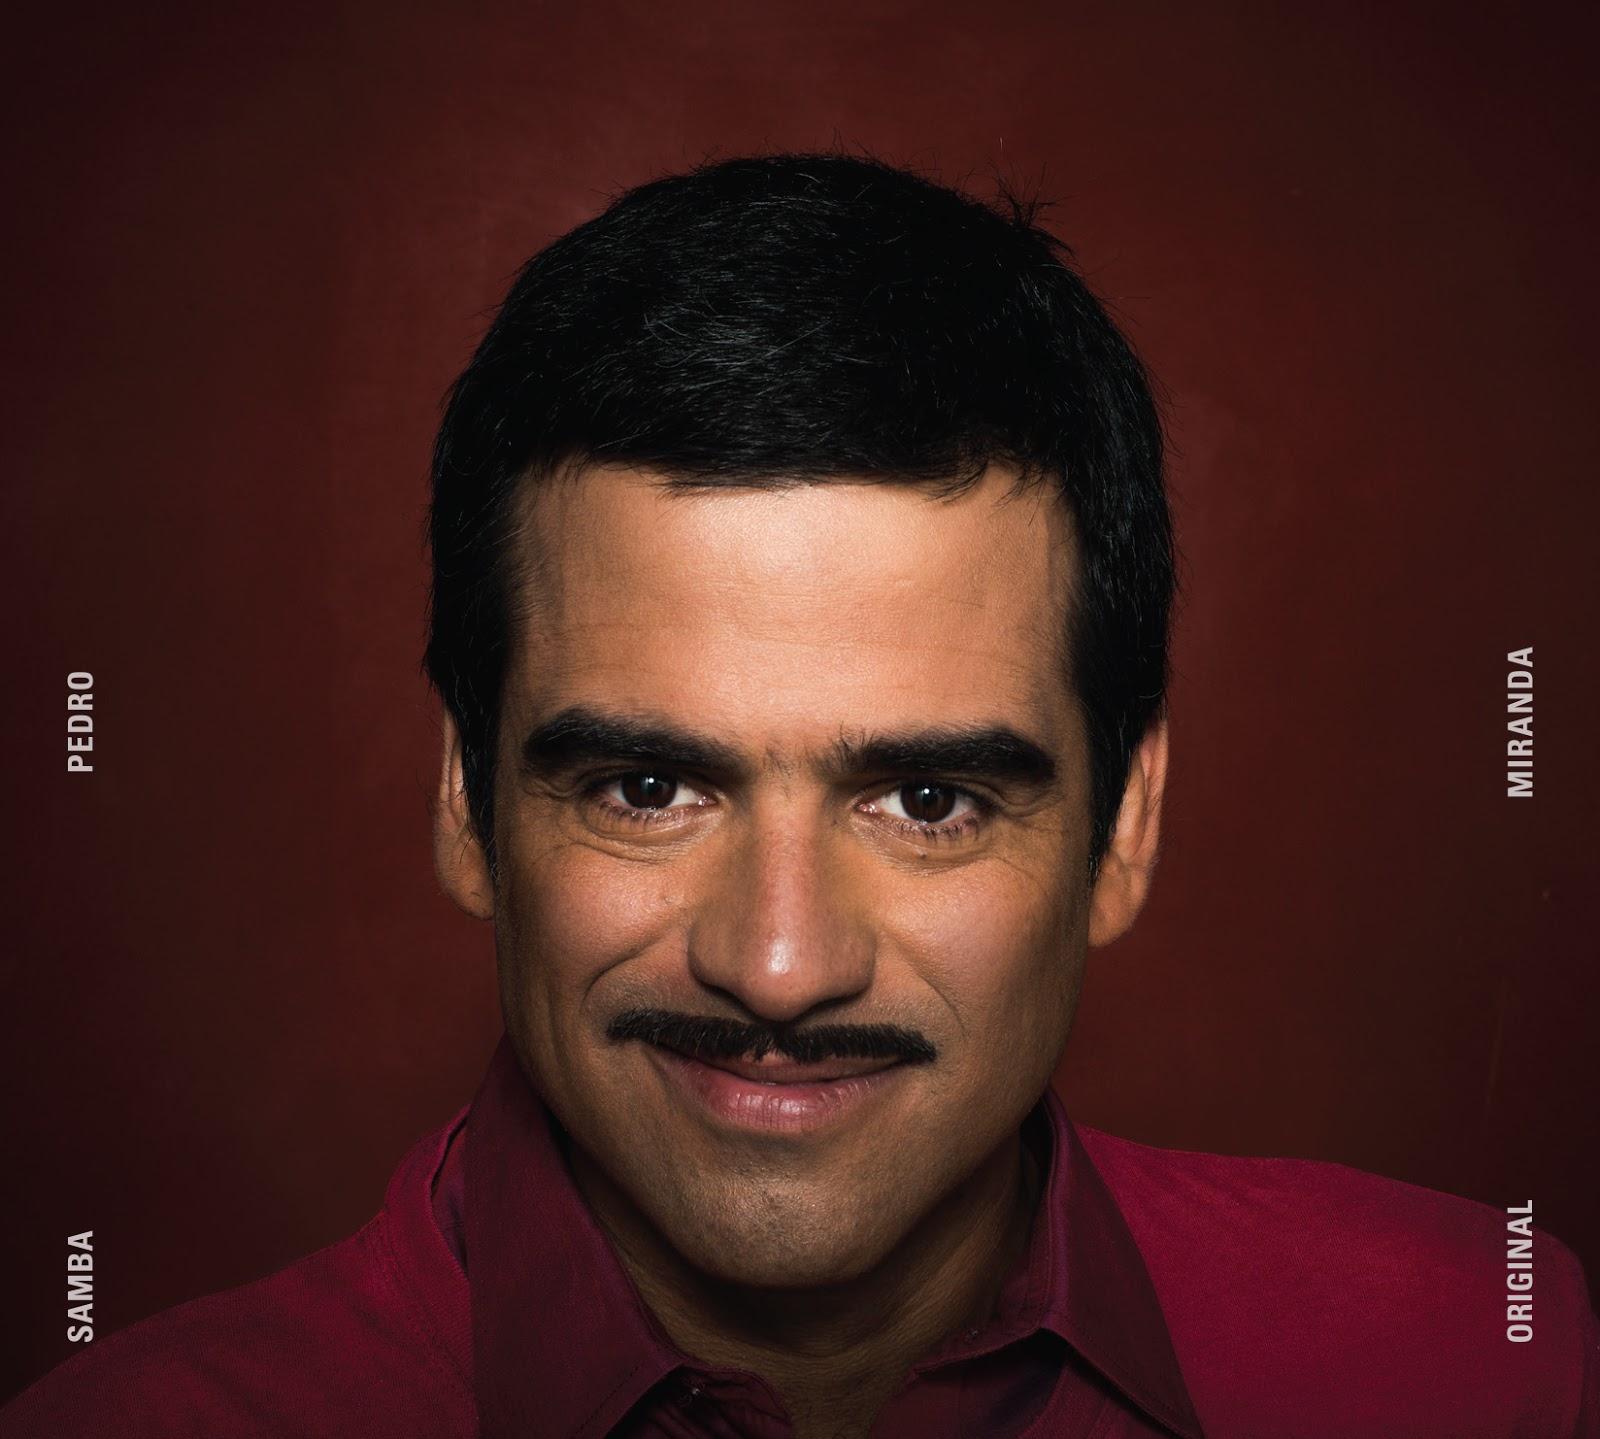 central-da-mpb-cantor-pedro-miranda-foto-capa-album-cd-disco-samba-original